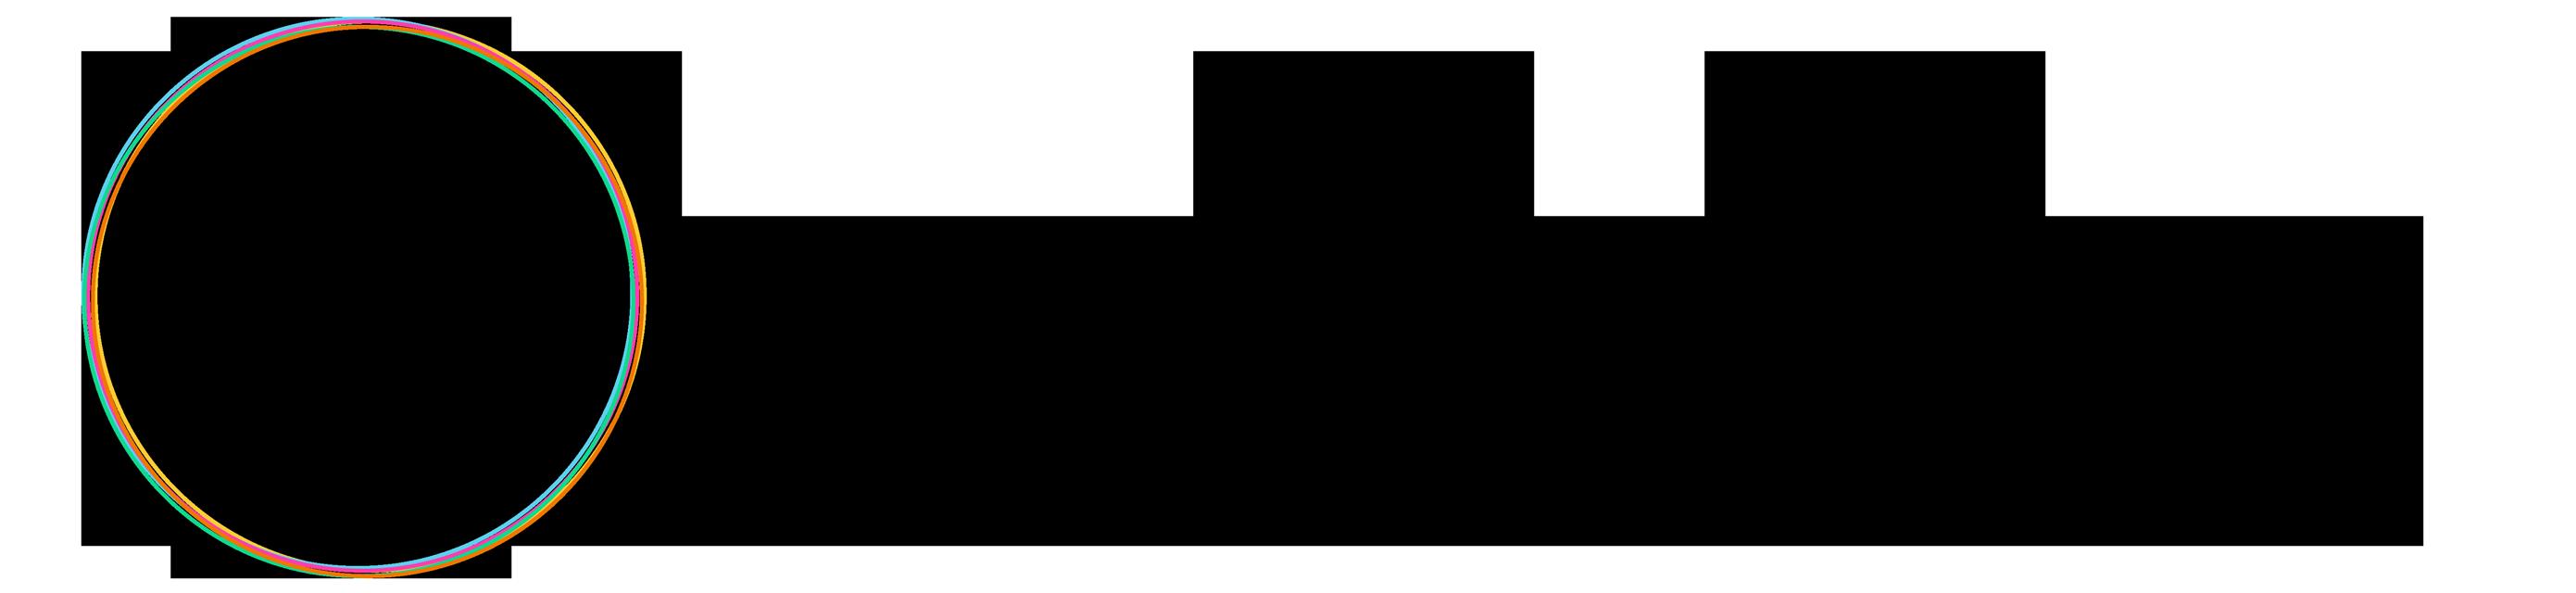 mazrica times logo